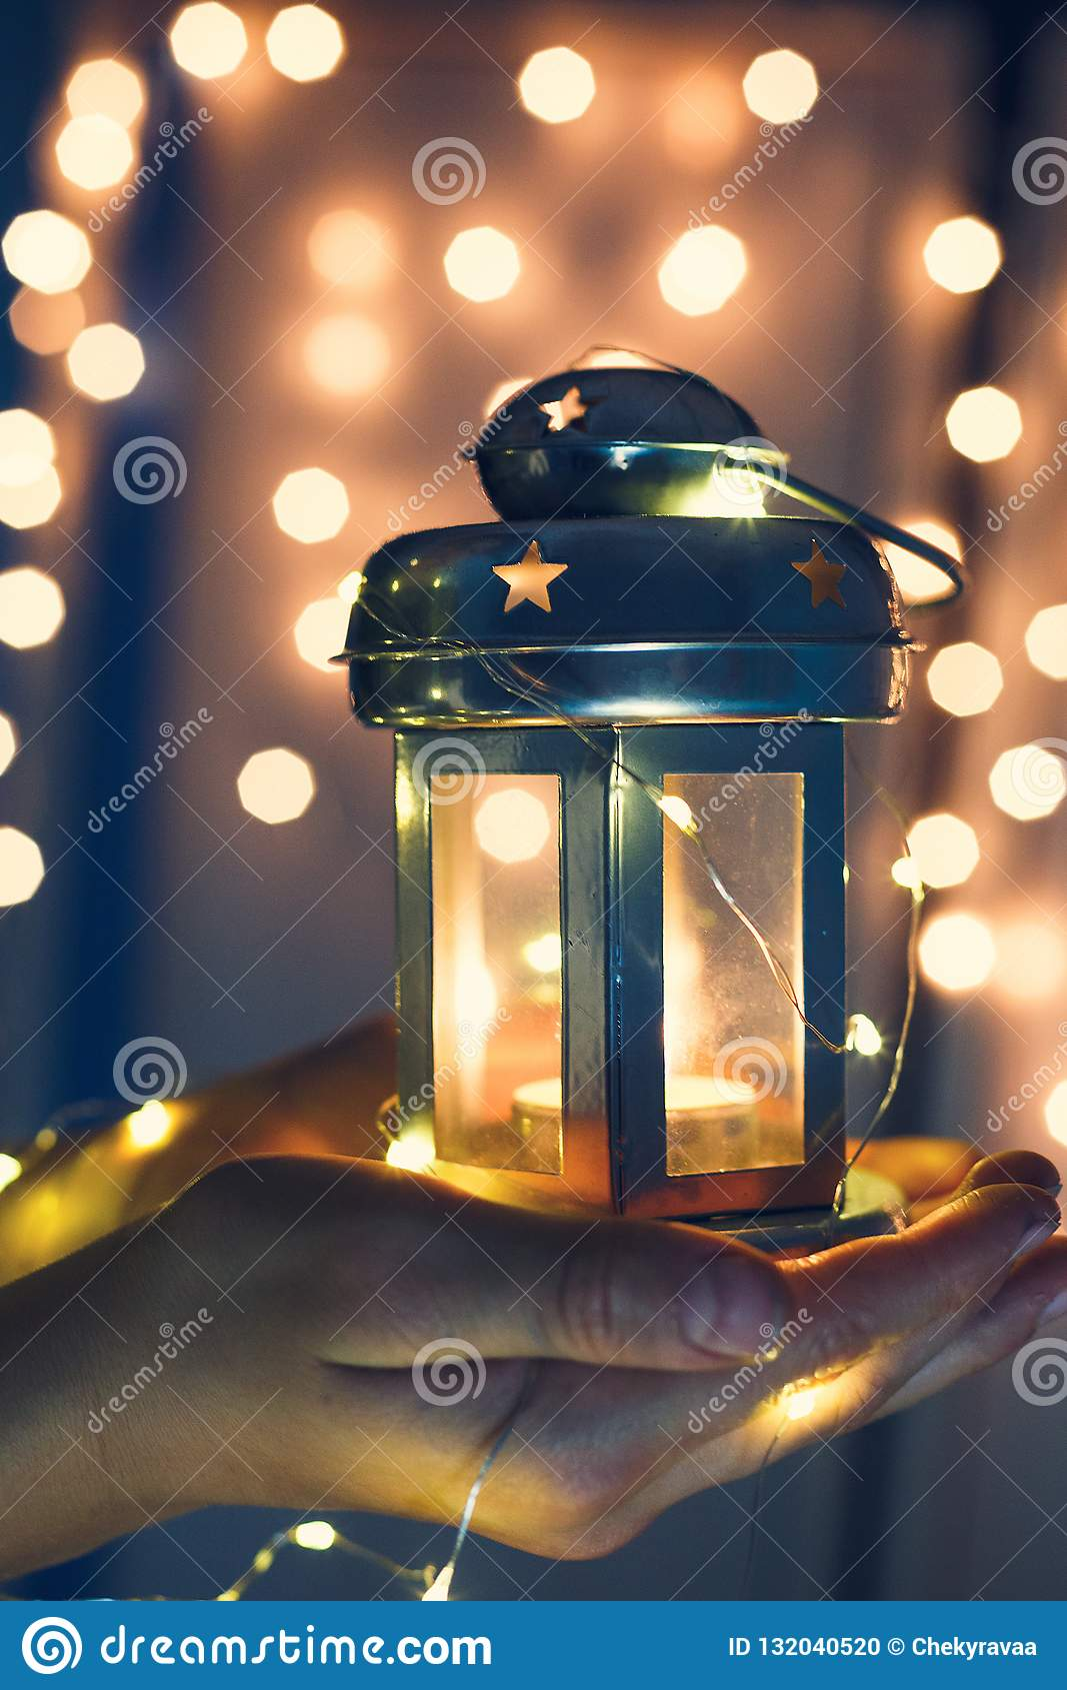 Kids holds Christmas lantern in hands on lights bokeh background.